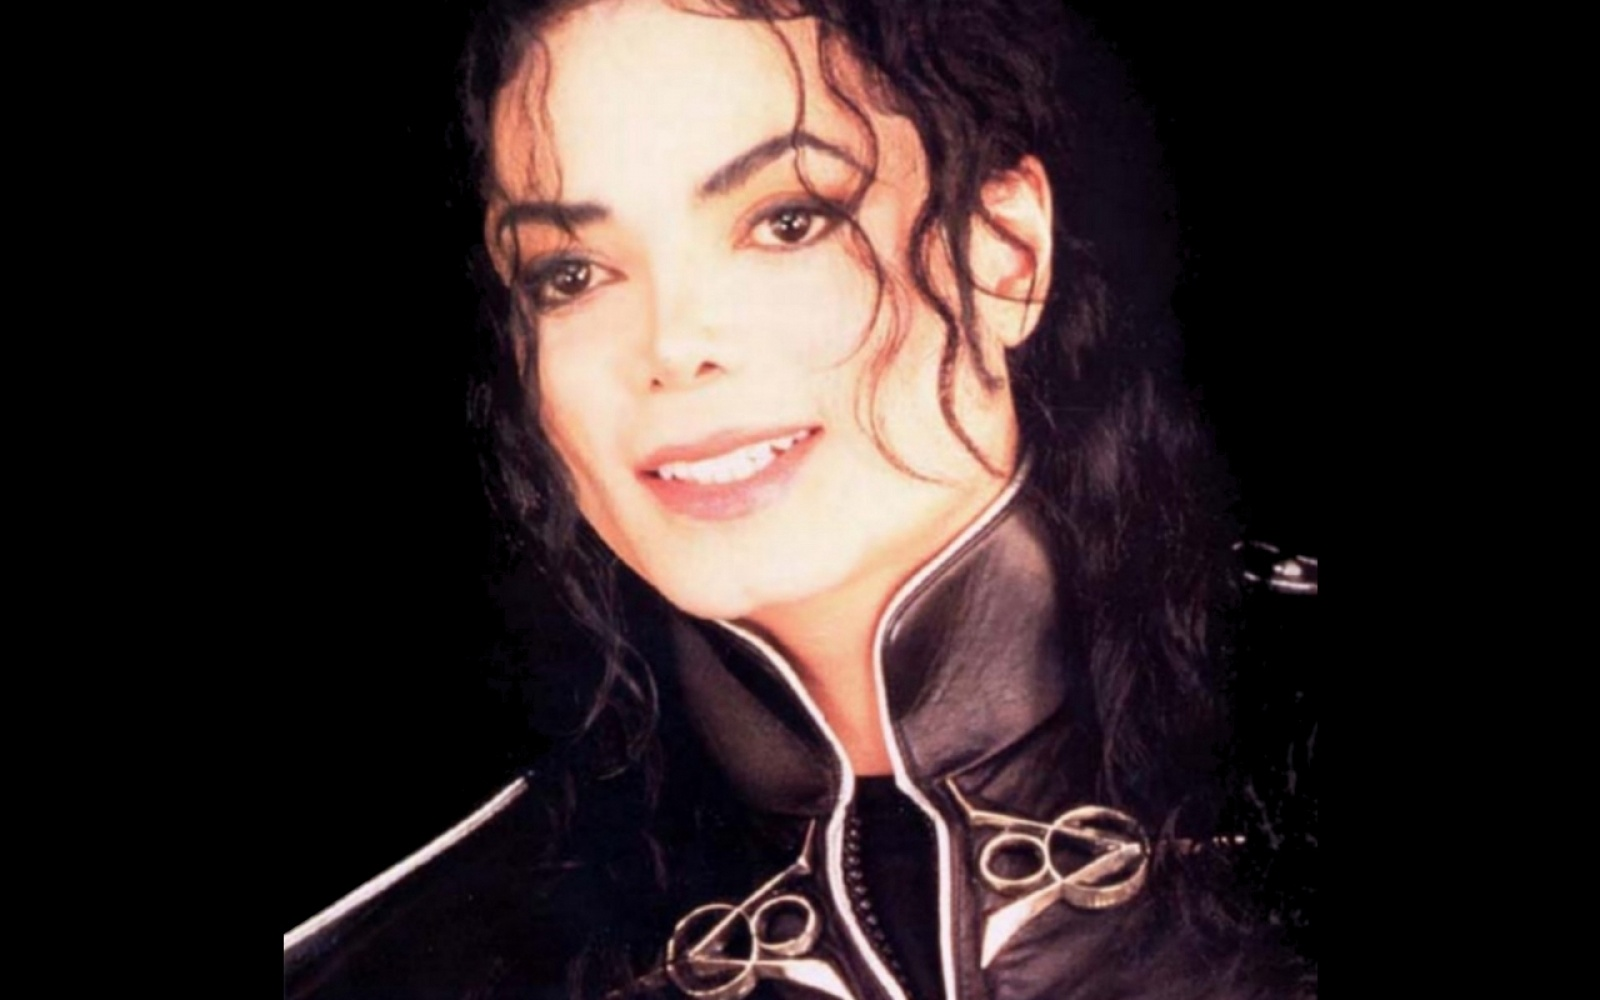 ws_Michael_Jackson_1600x1200